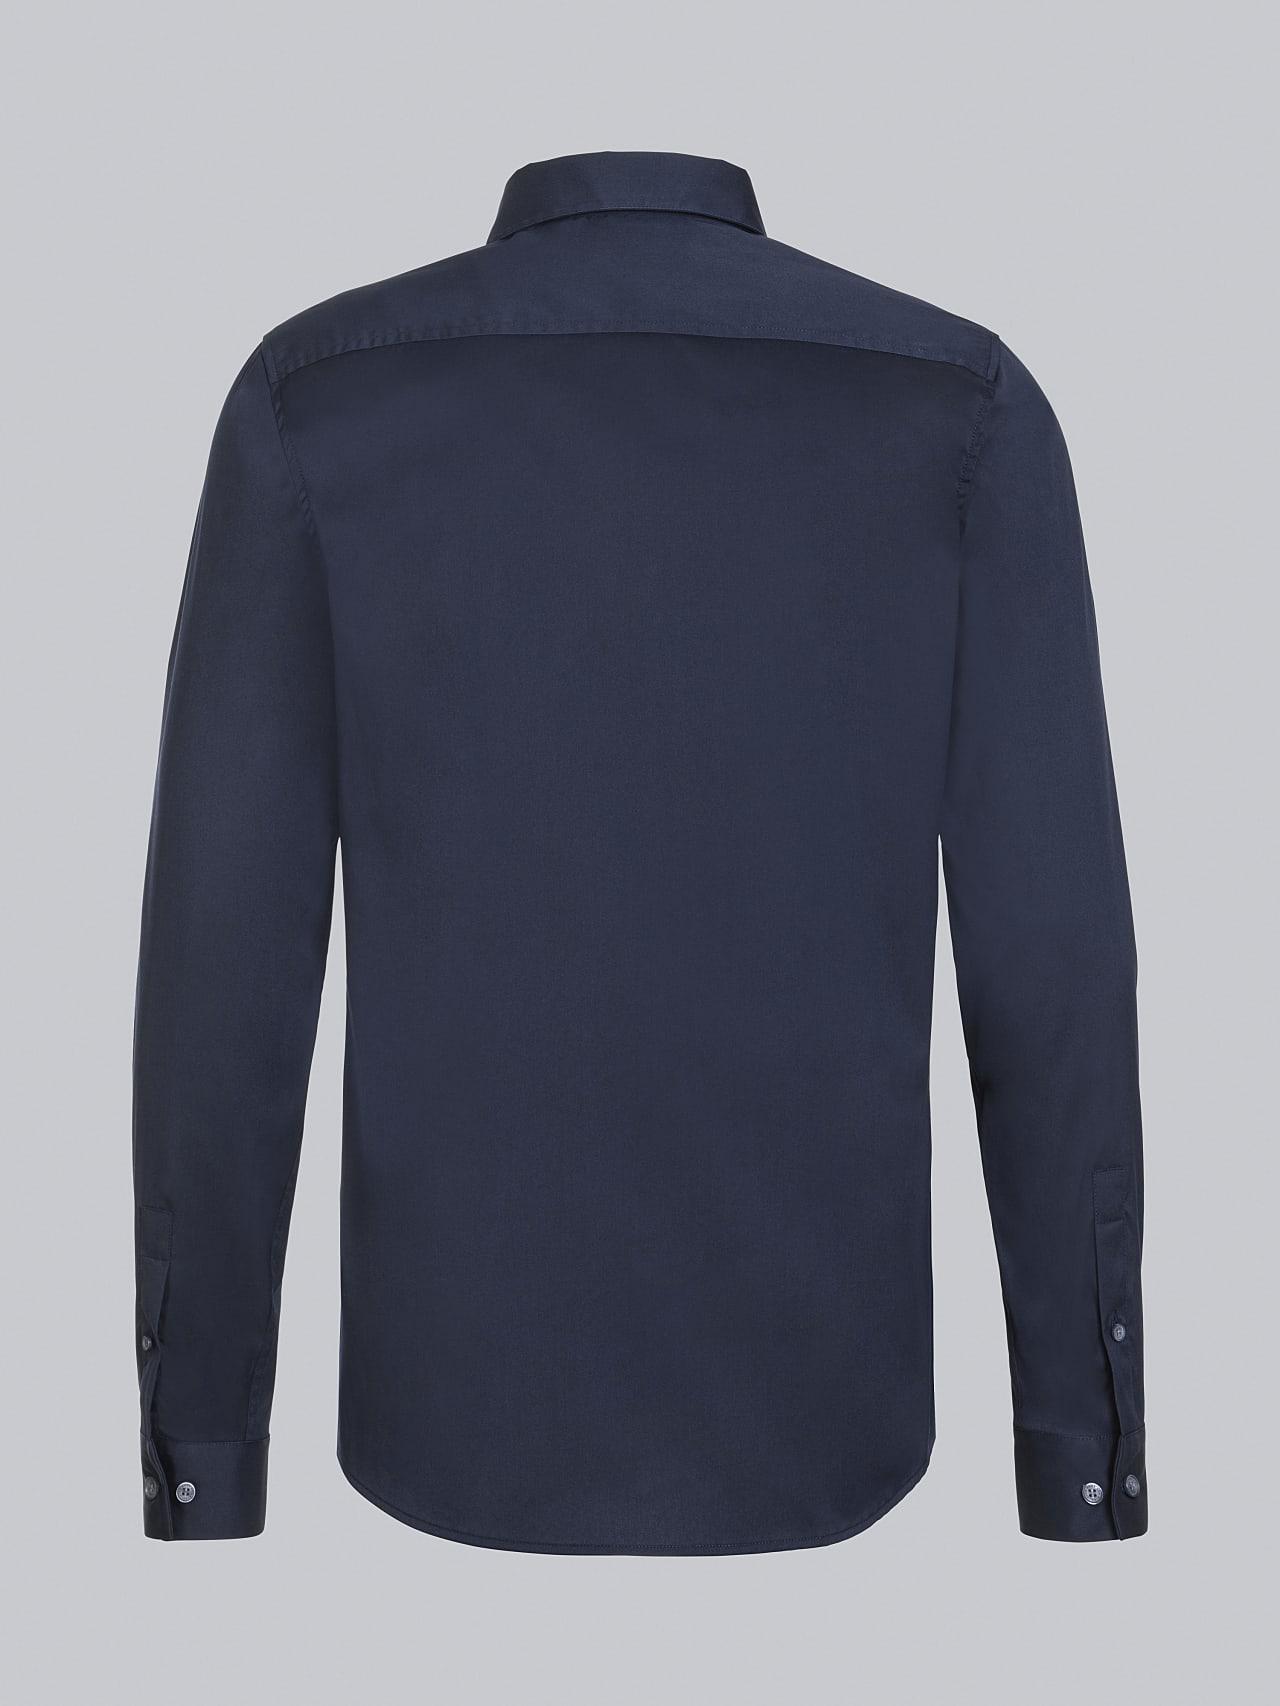 WAARG V2.Y5.02 Easy-Care Cotton Shirt navy Left Alpha Tauri